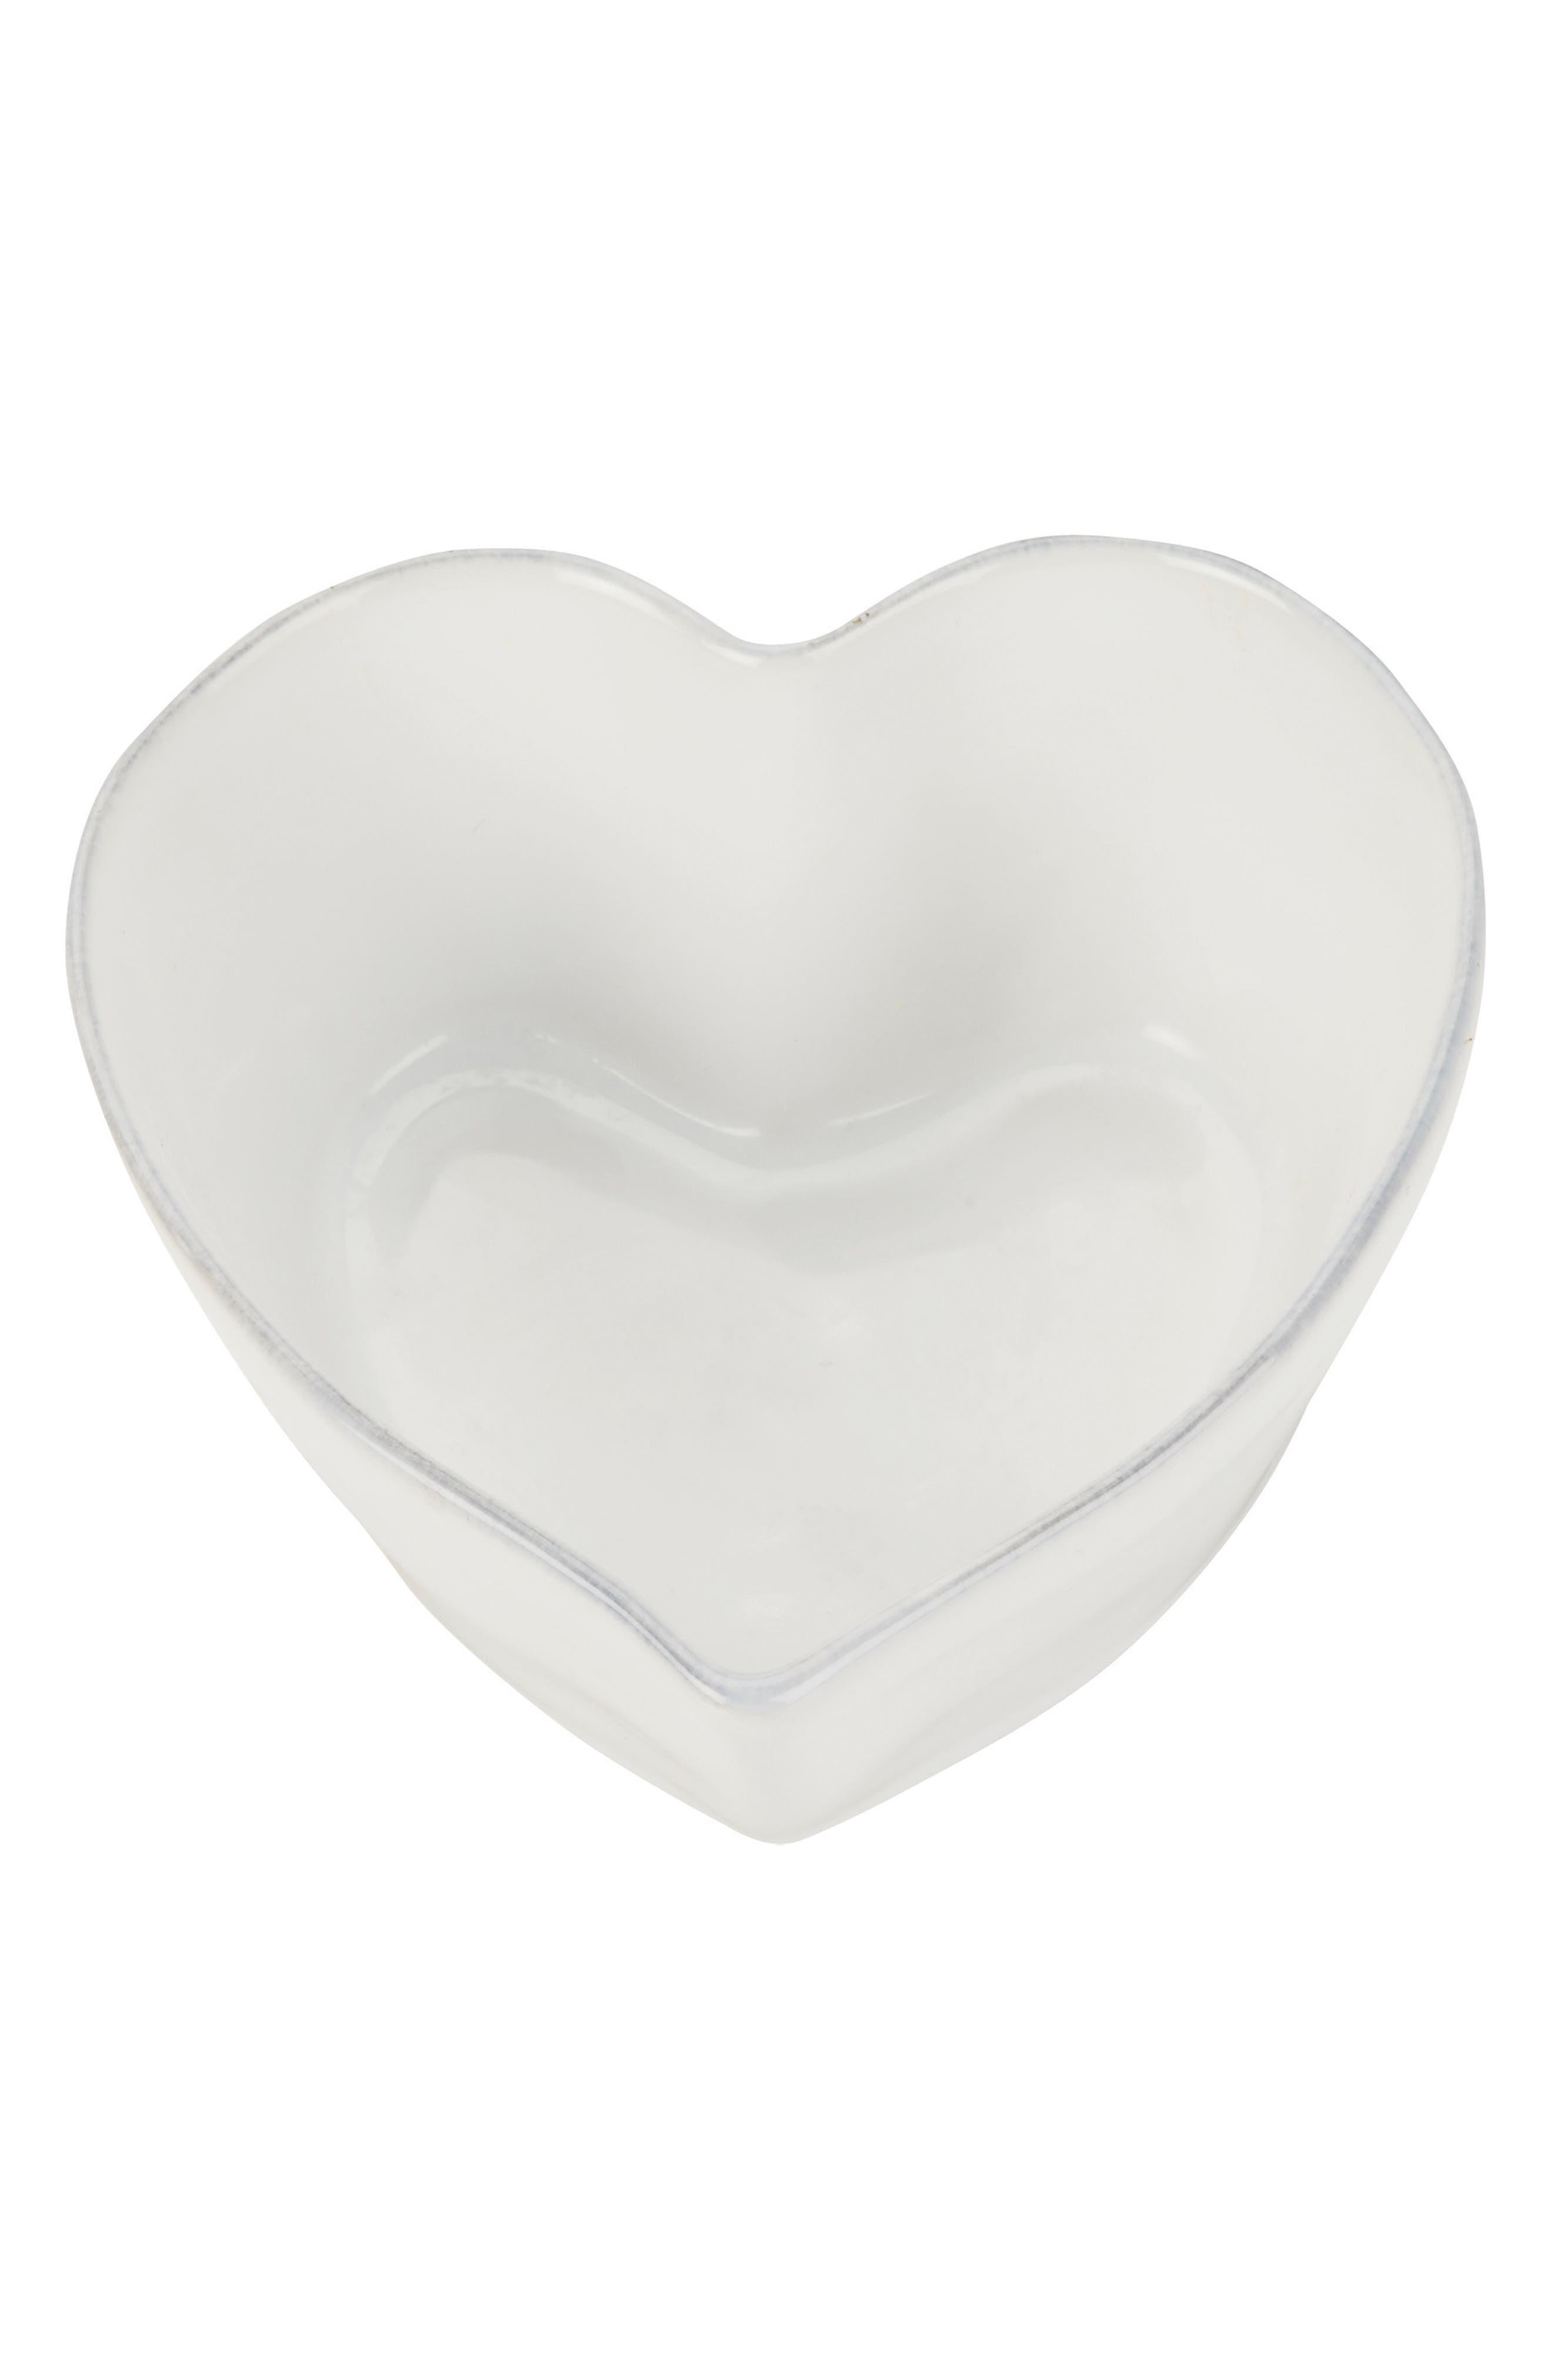 Porto Stoneware Heart Roaster,                             Main thumbnail 1, color,                             100